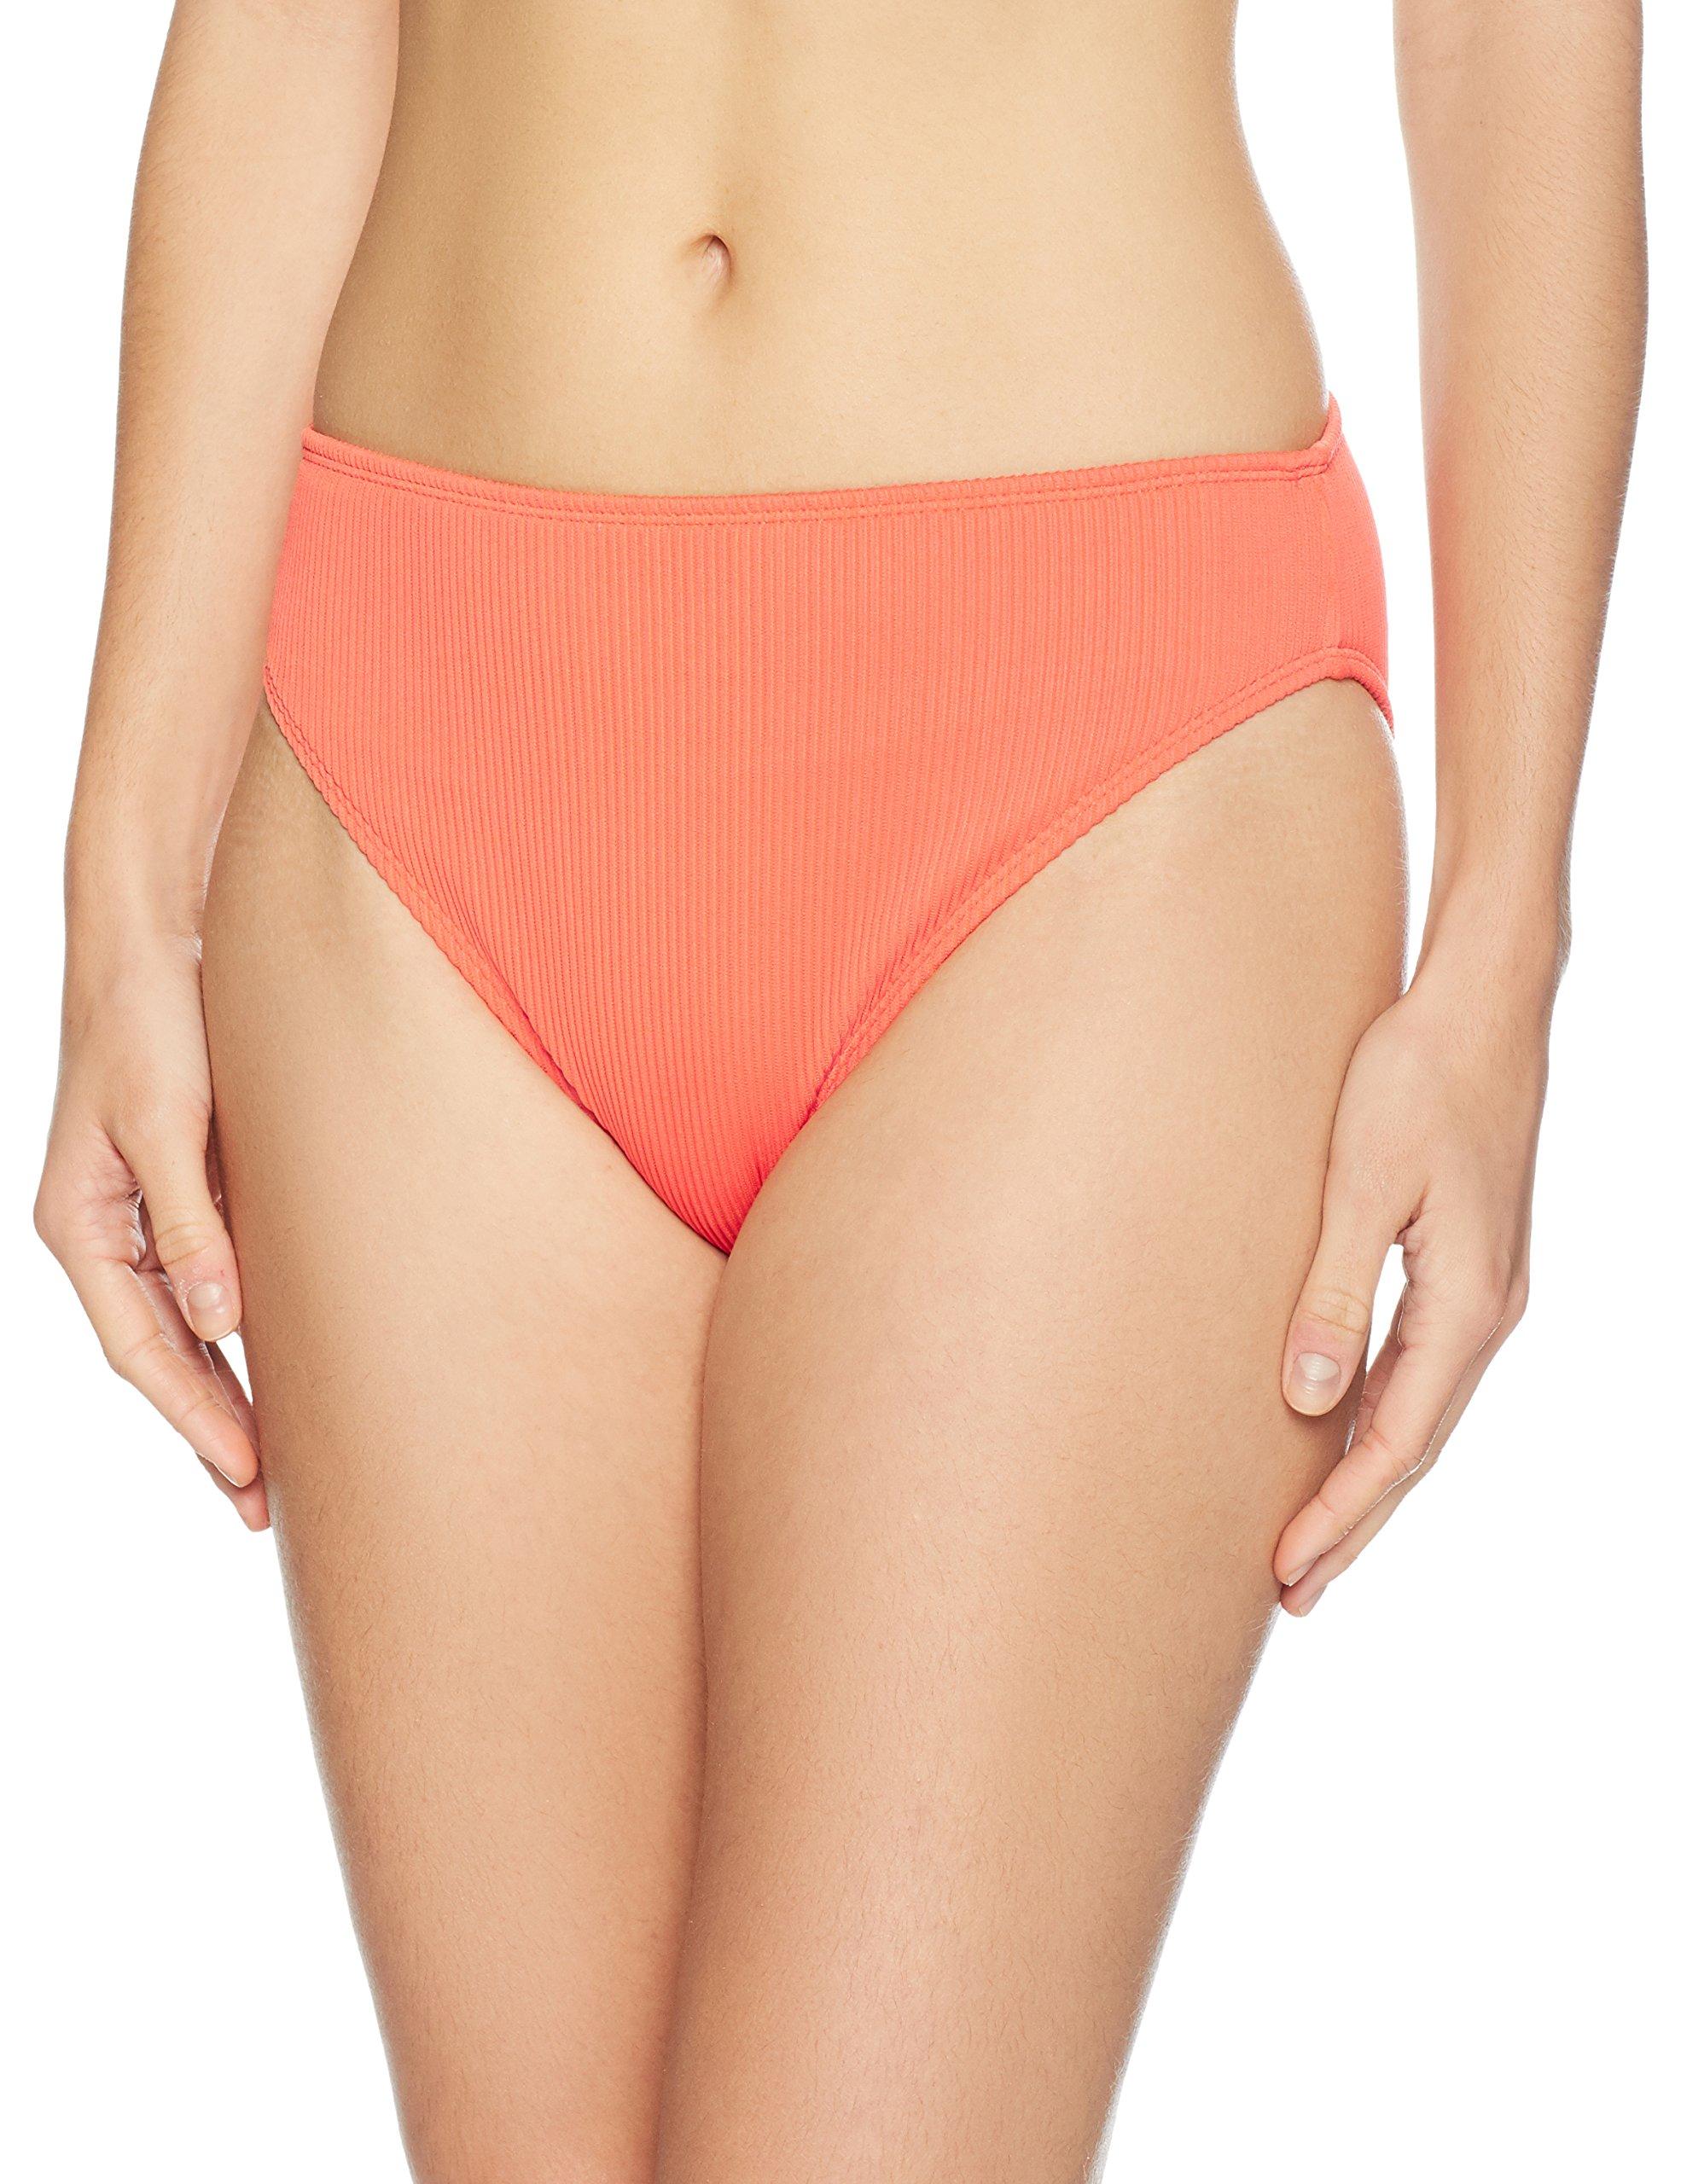 Amazon Brand - Mae Women's Swimwear Ribbed Bikini Bottom (for A-C cups)